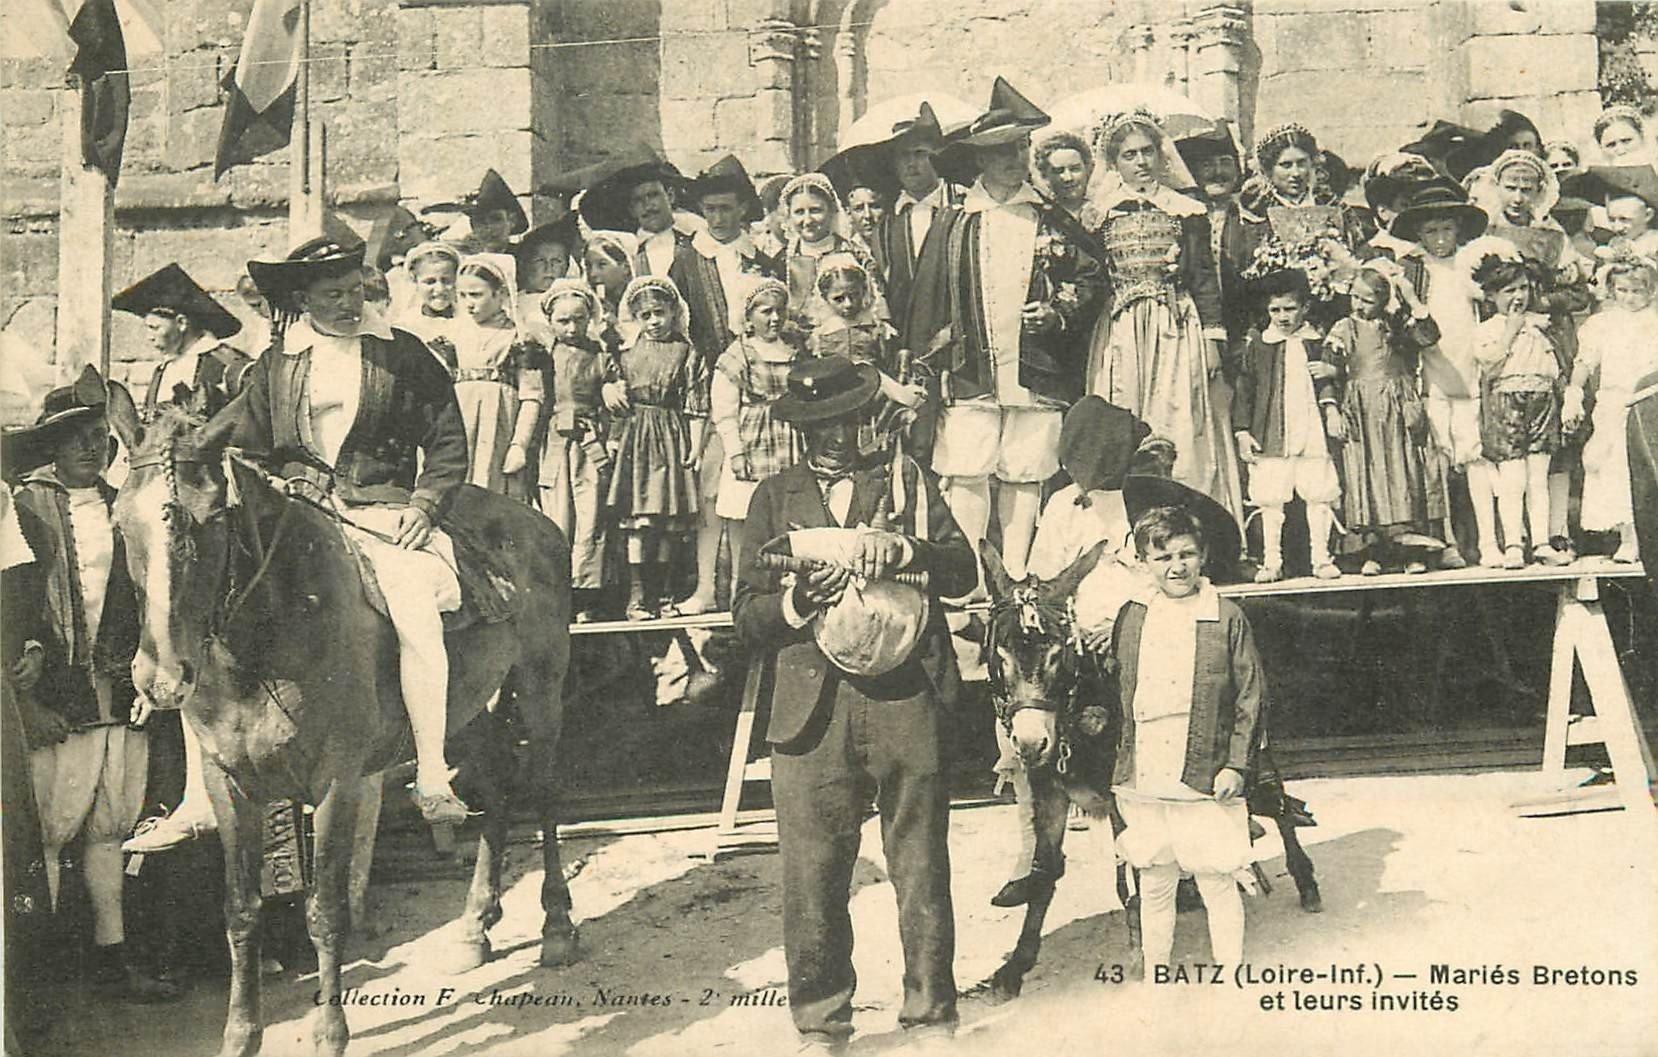 44 BATZ. Paludiers Mariés Bretons et leurs invités. Sel et marais salants